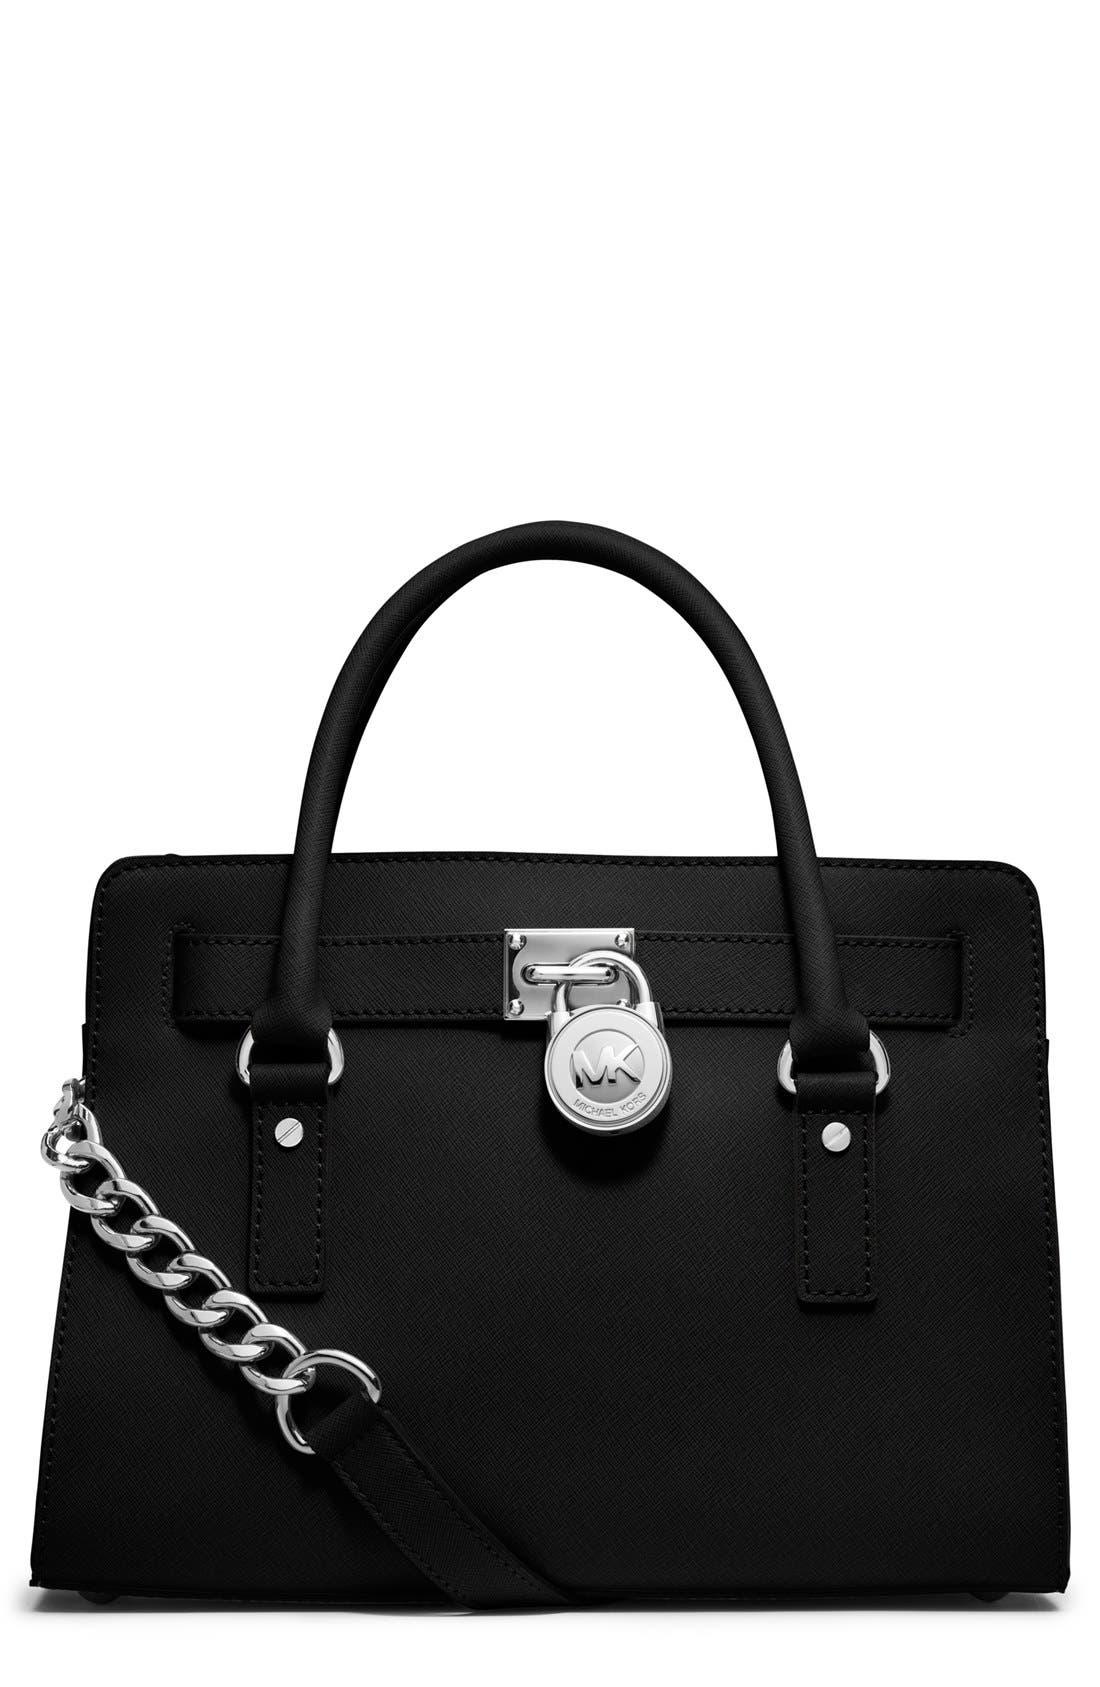 'Medium Hamilton' Saffiano Leather Satchel, Main, color, 001